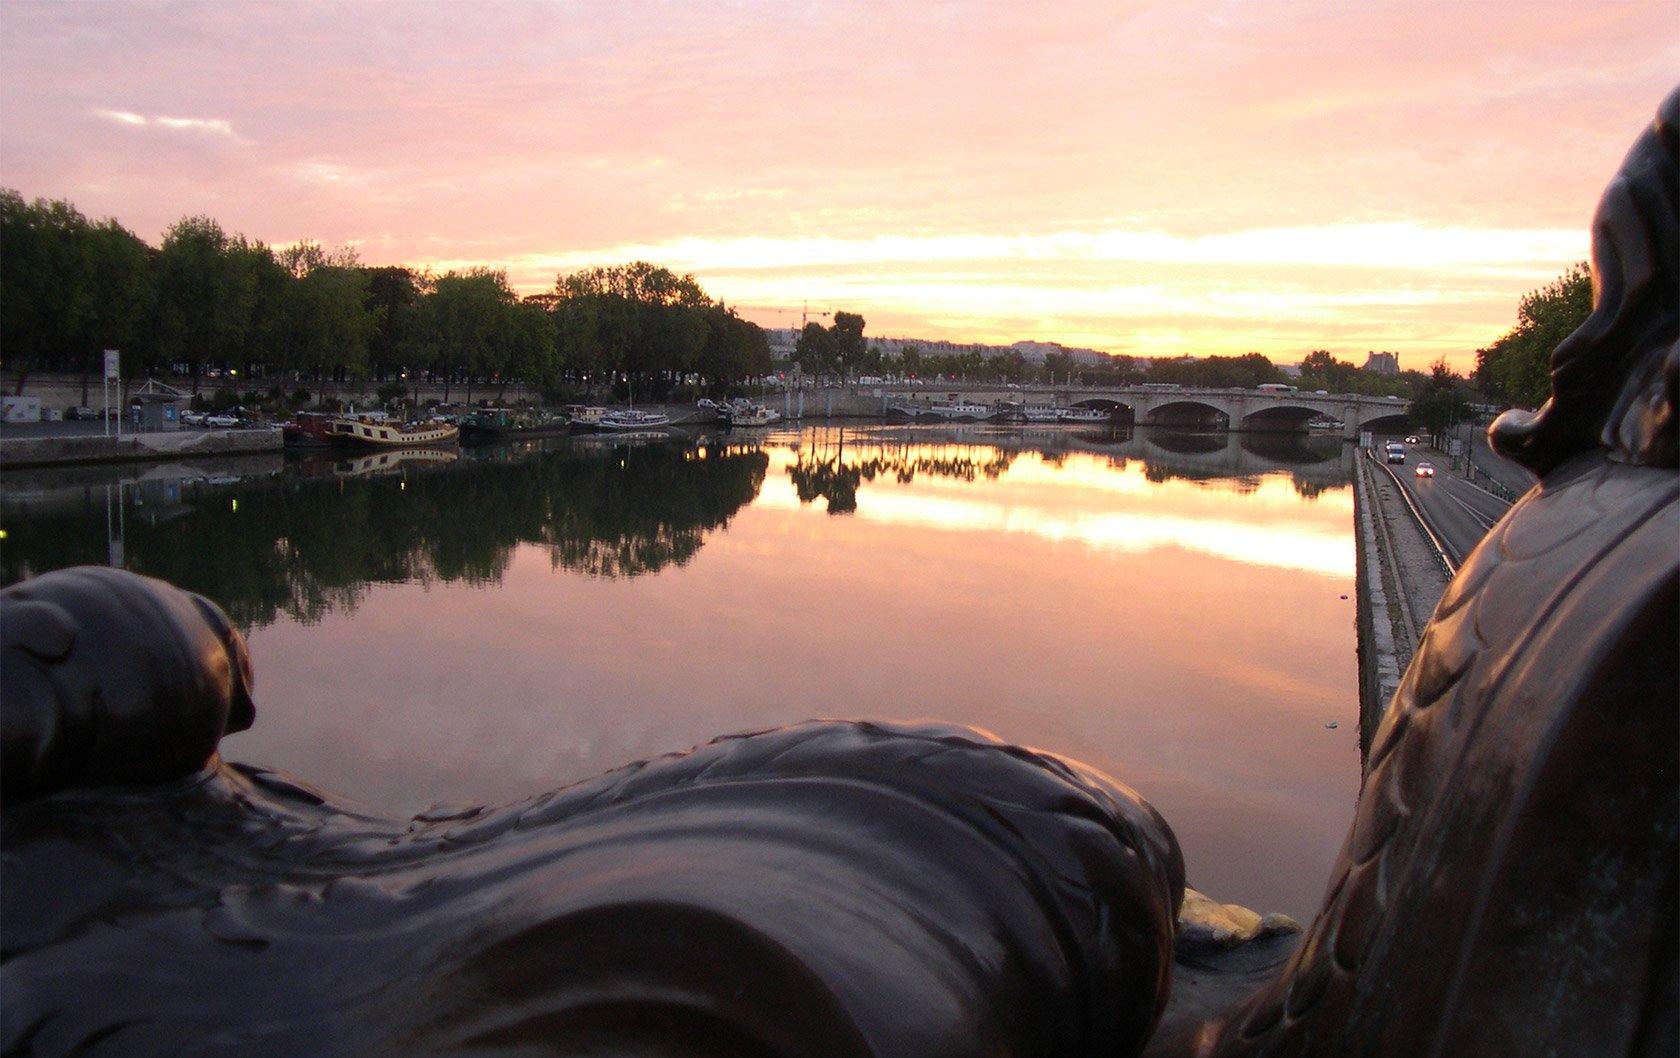 pont-alexandre-iii-sunset-paris-12